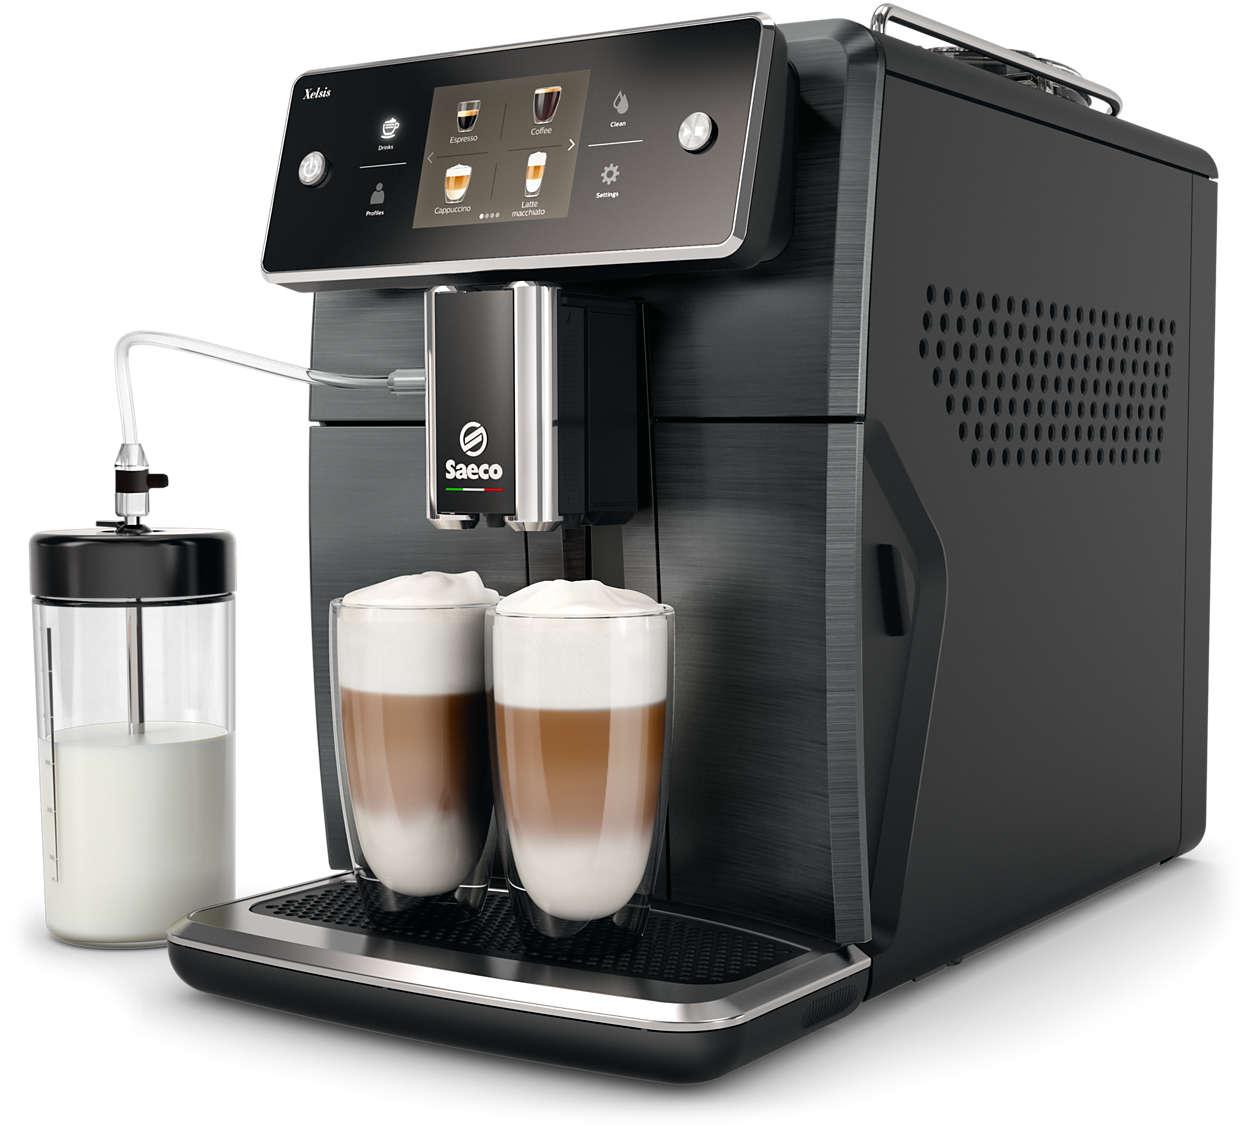 Image result for Automatic Espresso Machine